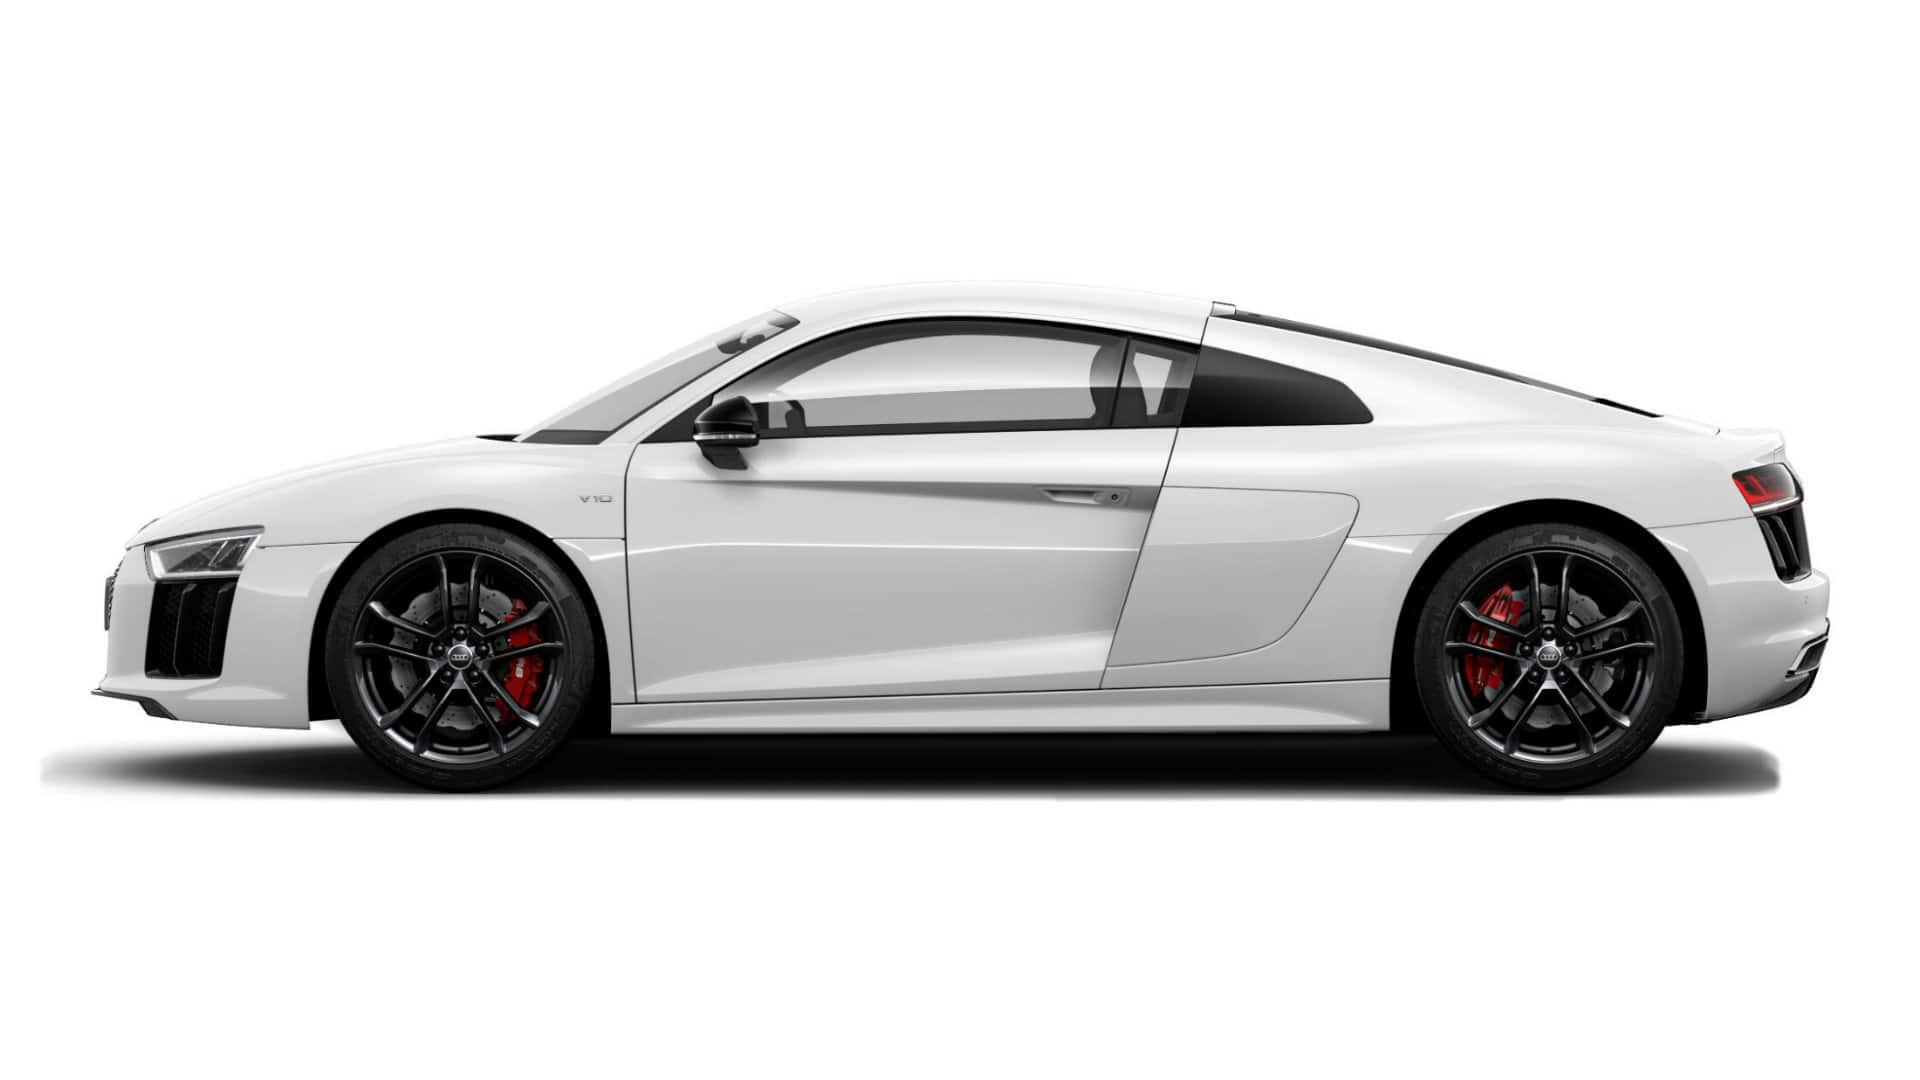 2018 R8 V10 Coup 233 Rws Gt R8 Gt Audi Canada